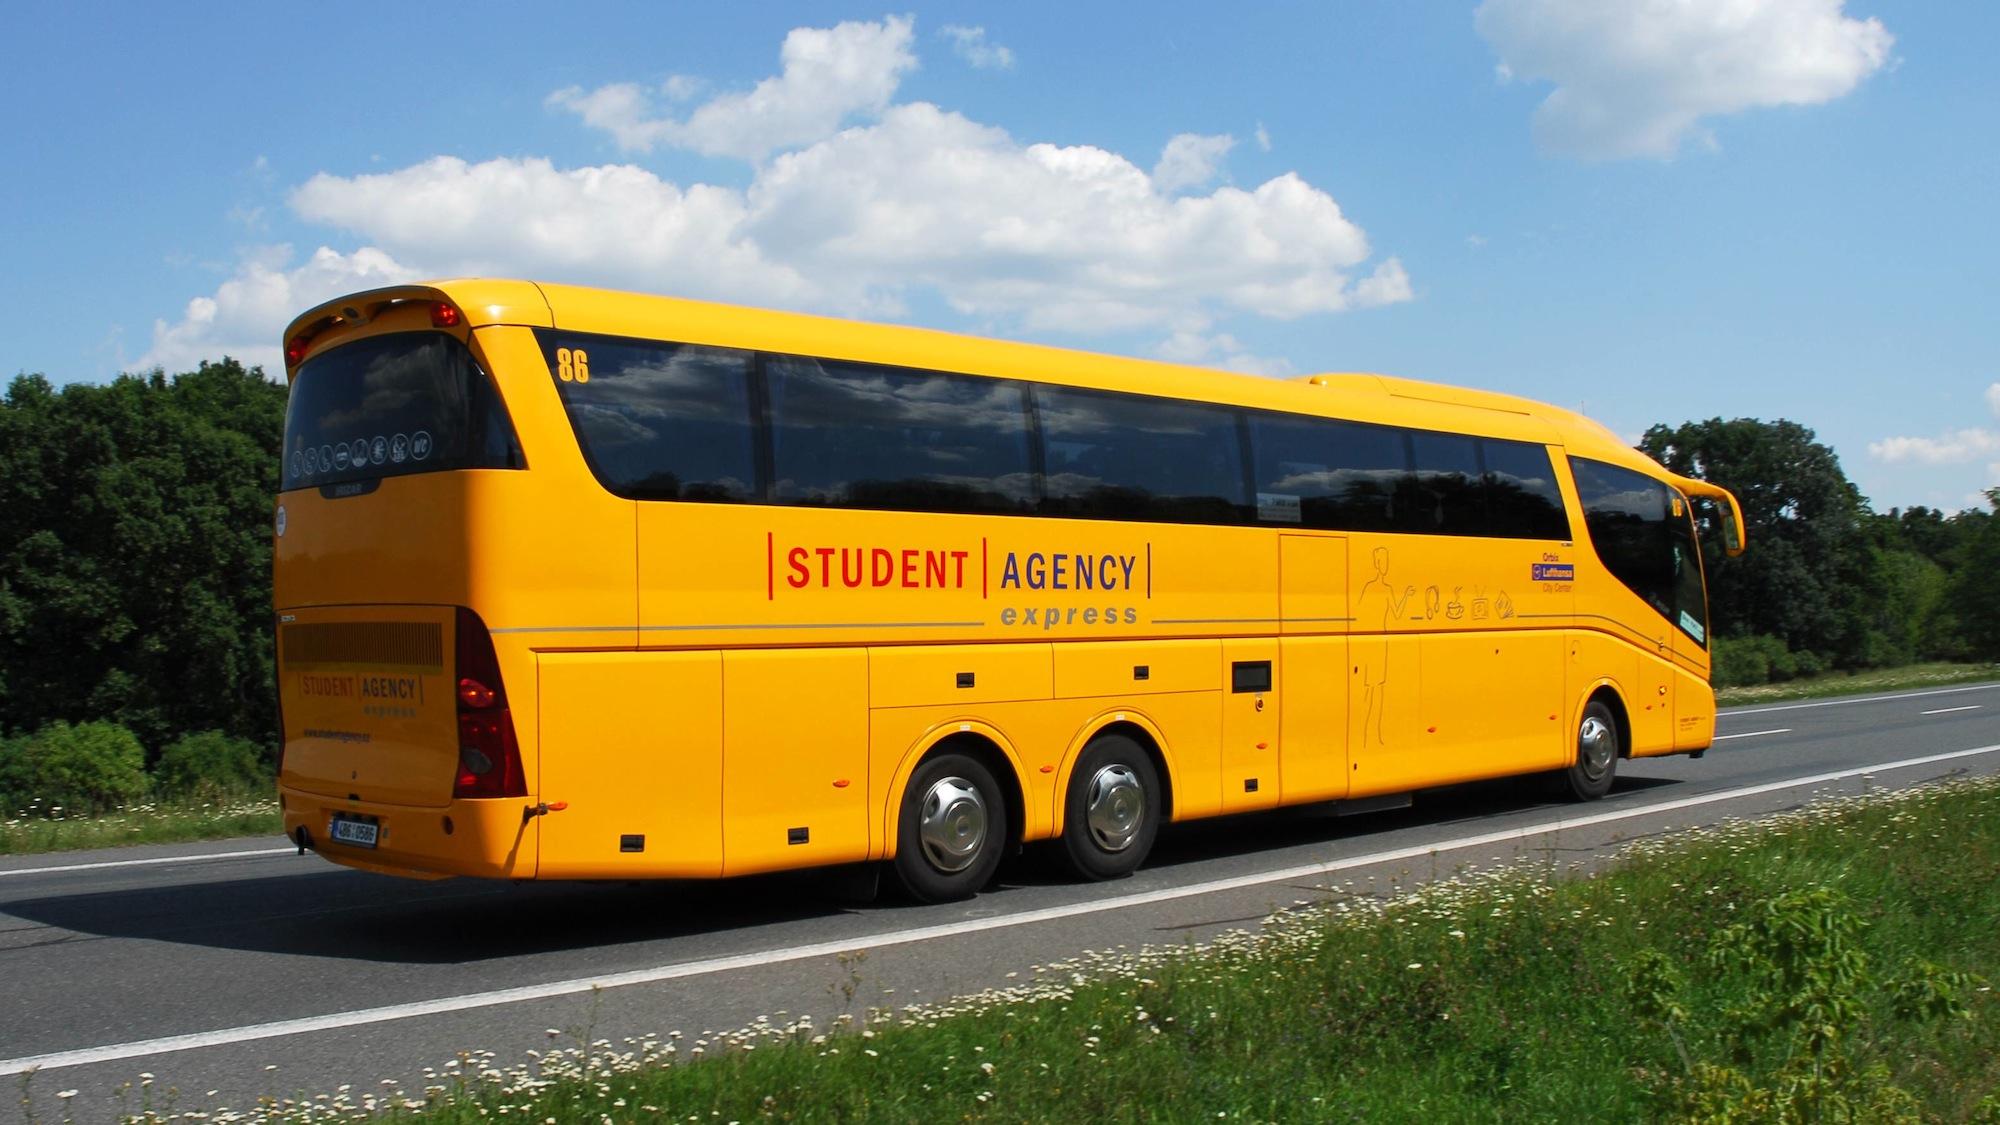 studentagency-cz-autobus-student-agency-zluty-doprava-1-orig.jpg